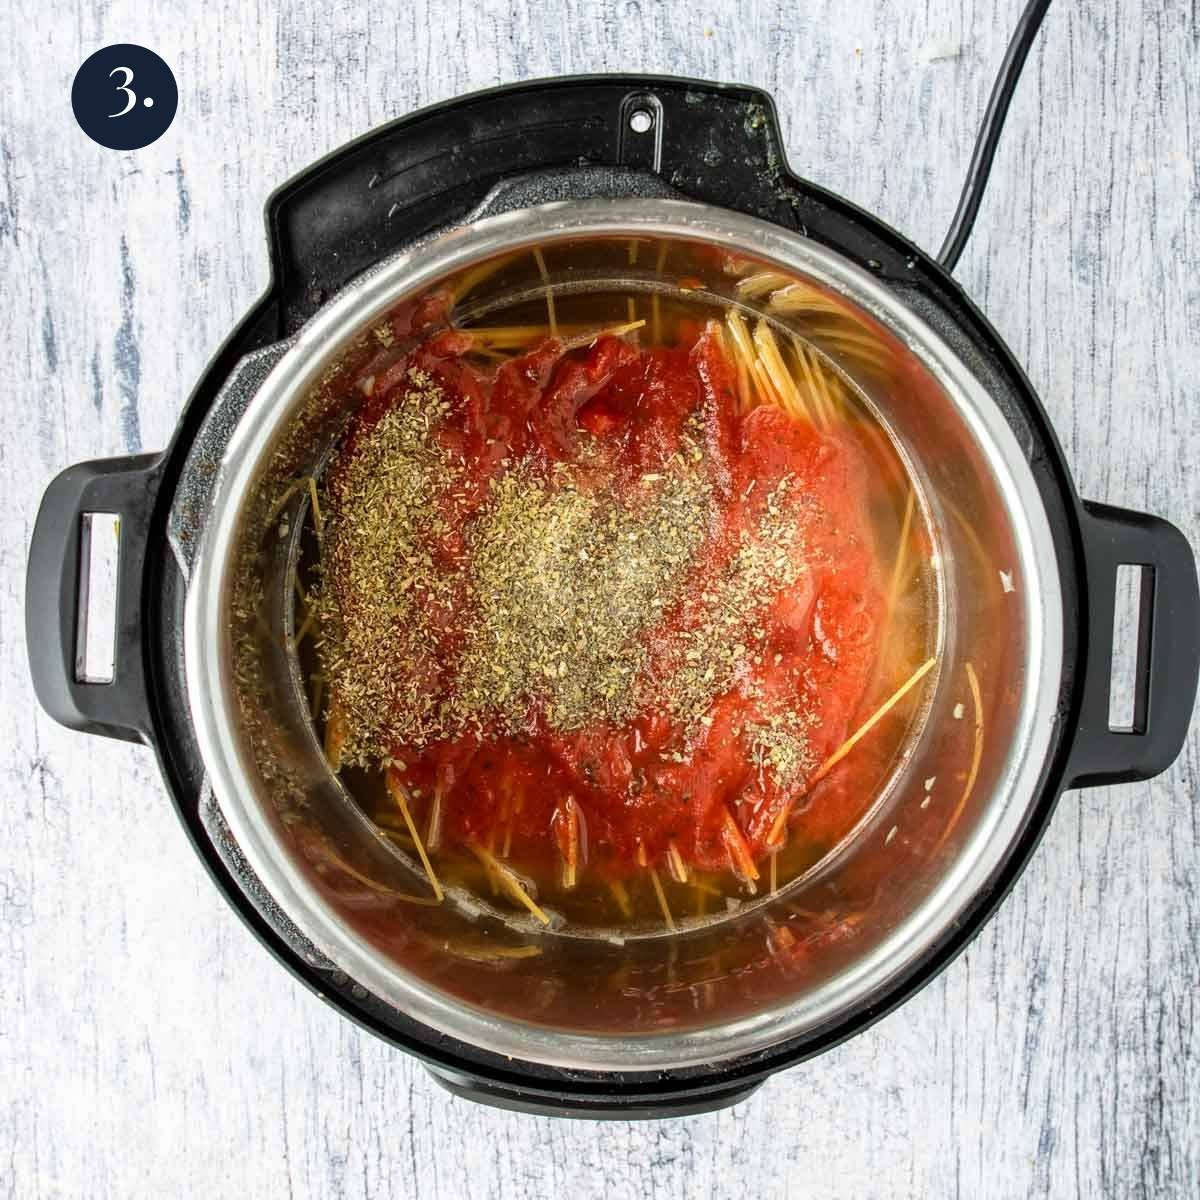 marinara sauce on top of spaghetti in the instant pot